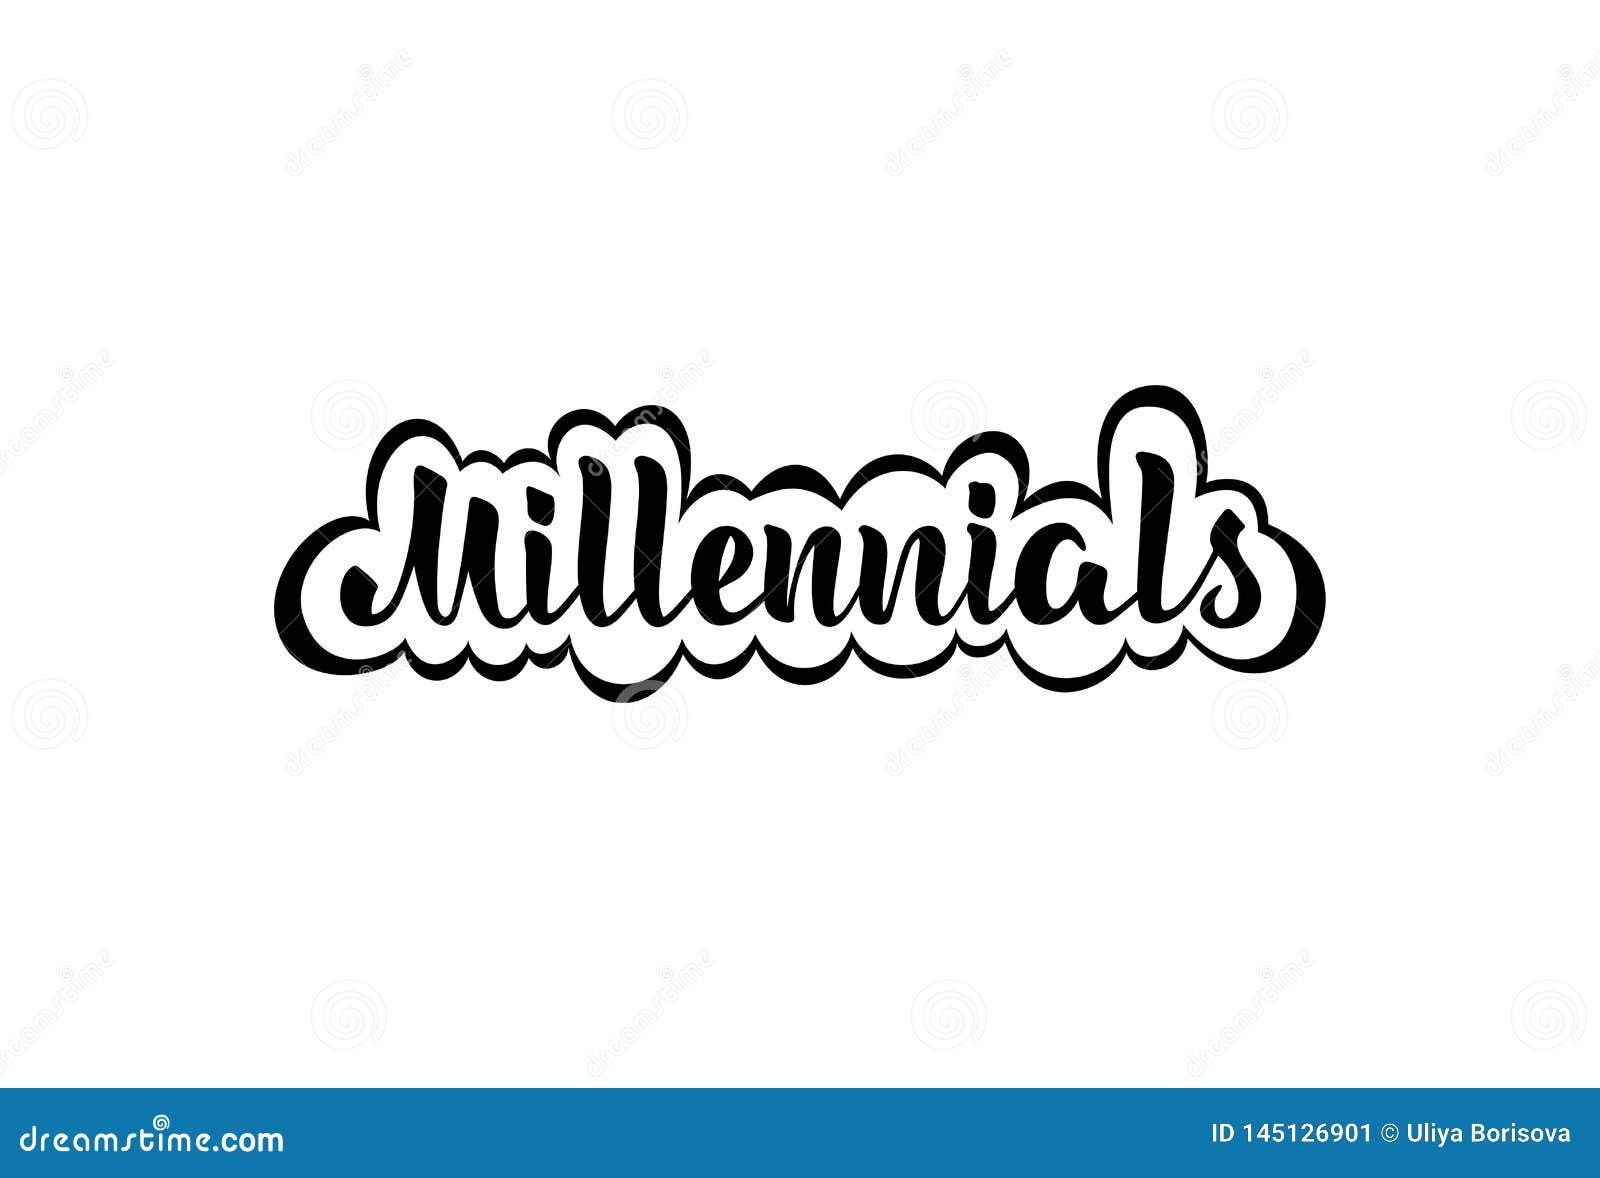 Millennials. Handwritten phrase. Lettering.